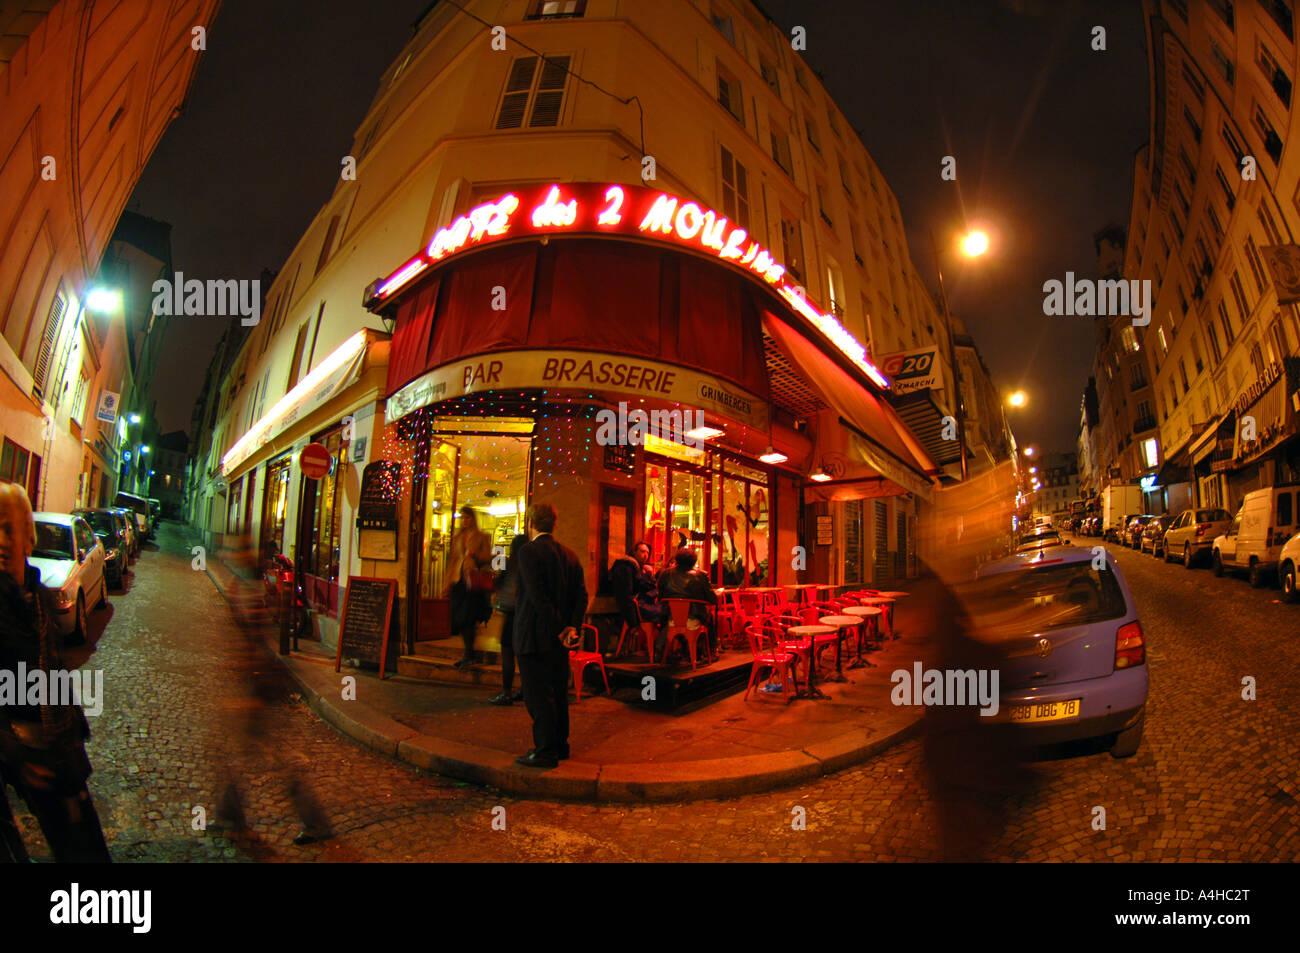 Cafe des deux Moulin Paris France, location for the recording of the film Amelie Stock Photo